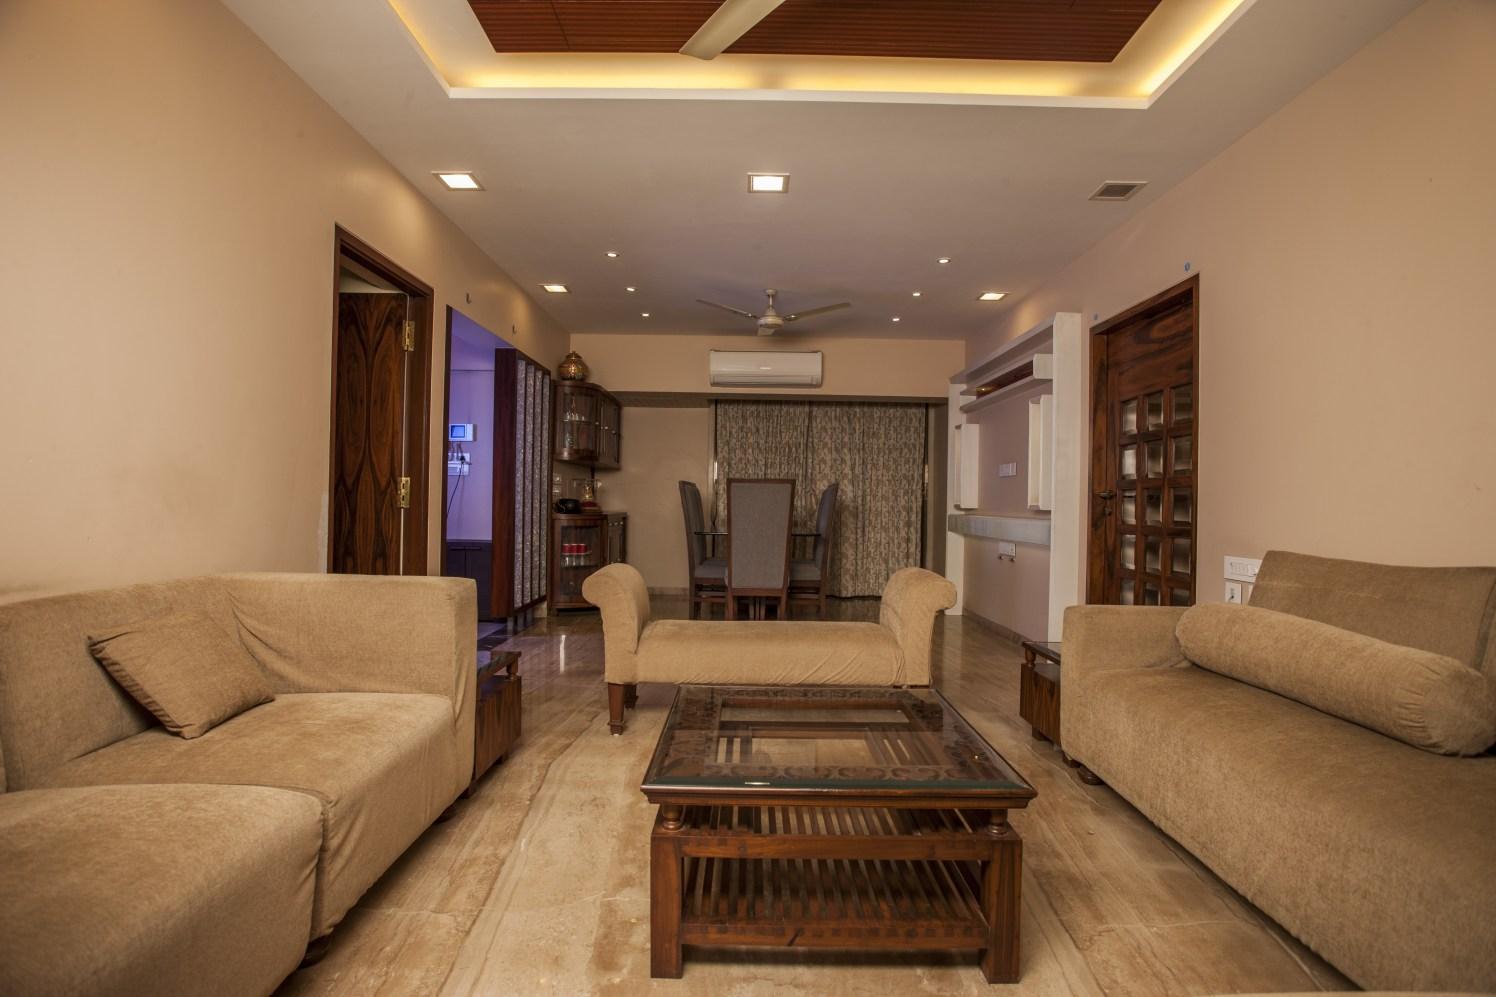 Lavish Affair by Plus One Interiors Living-room Contemporary | Interior Design Photos & Ideas